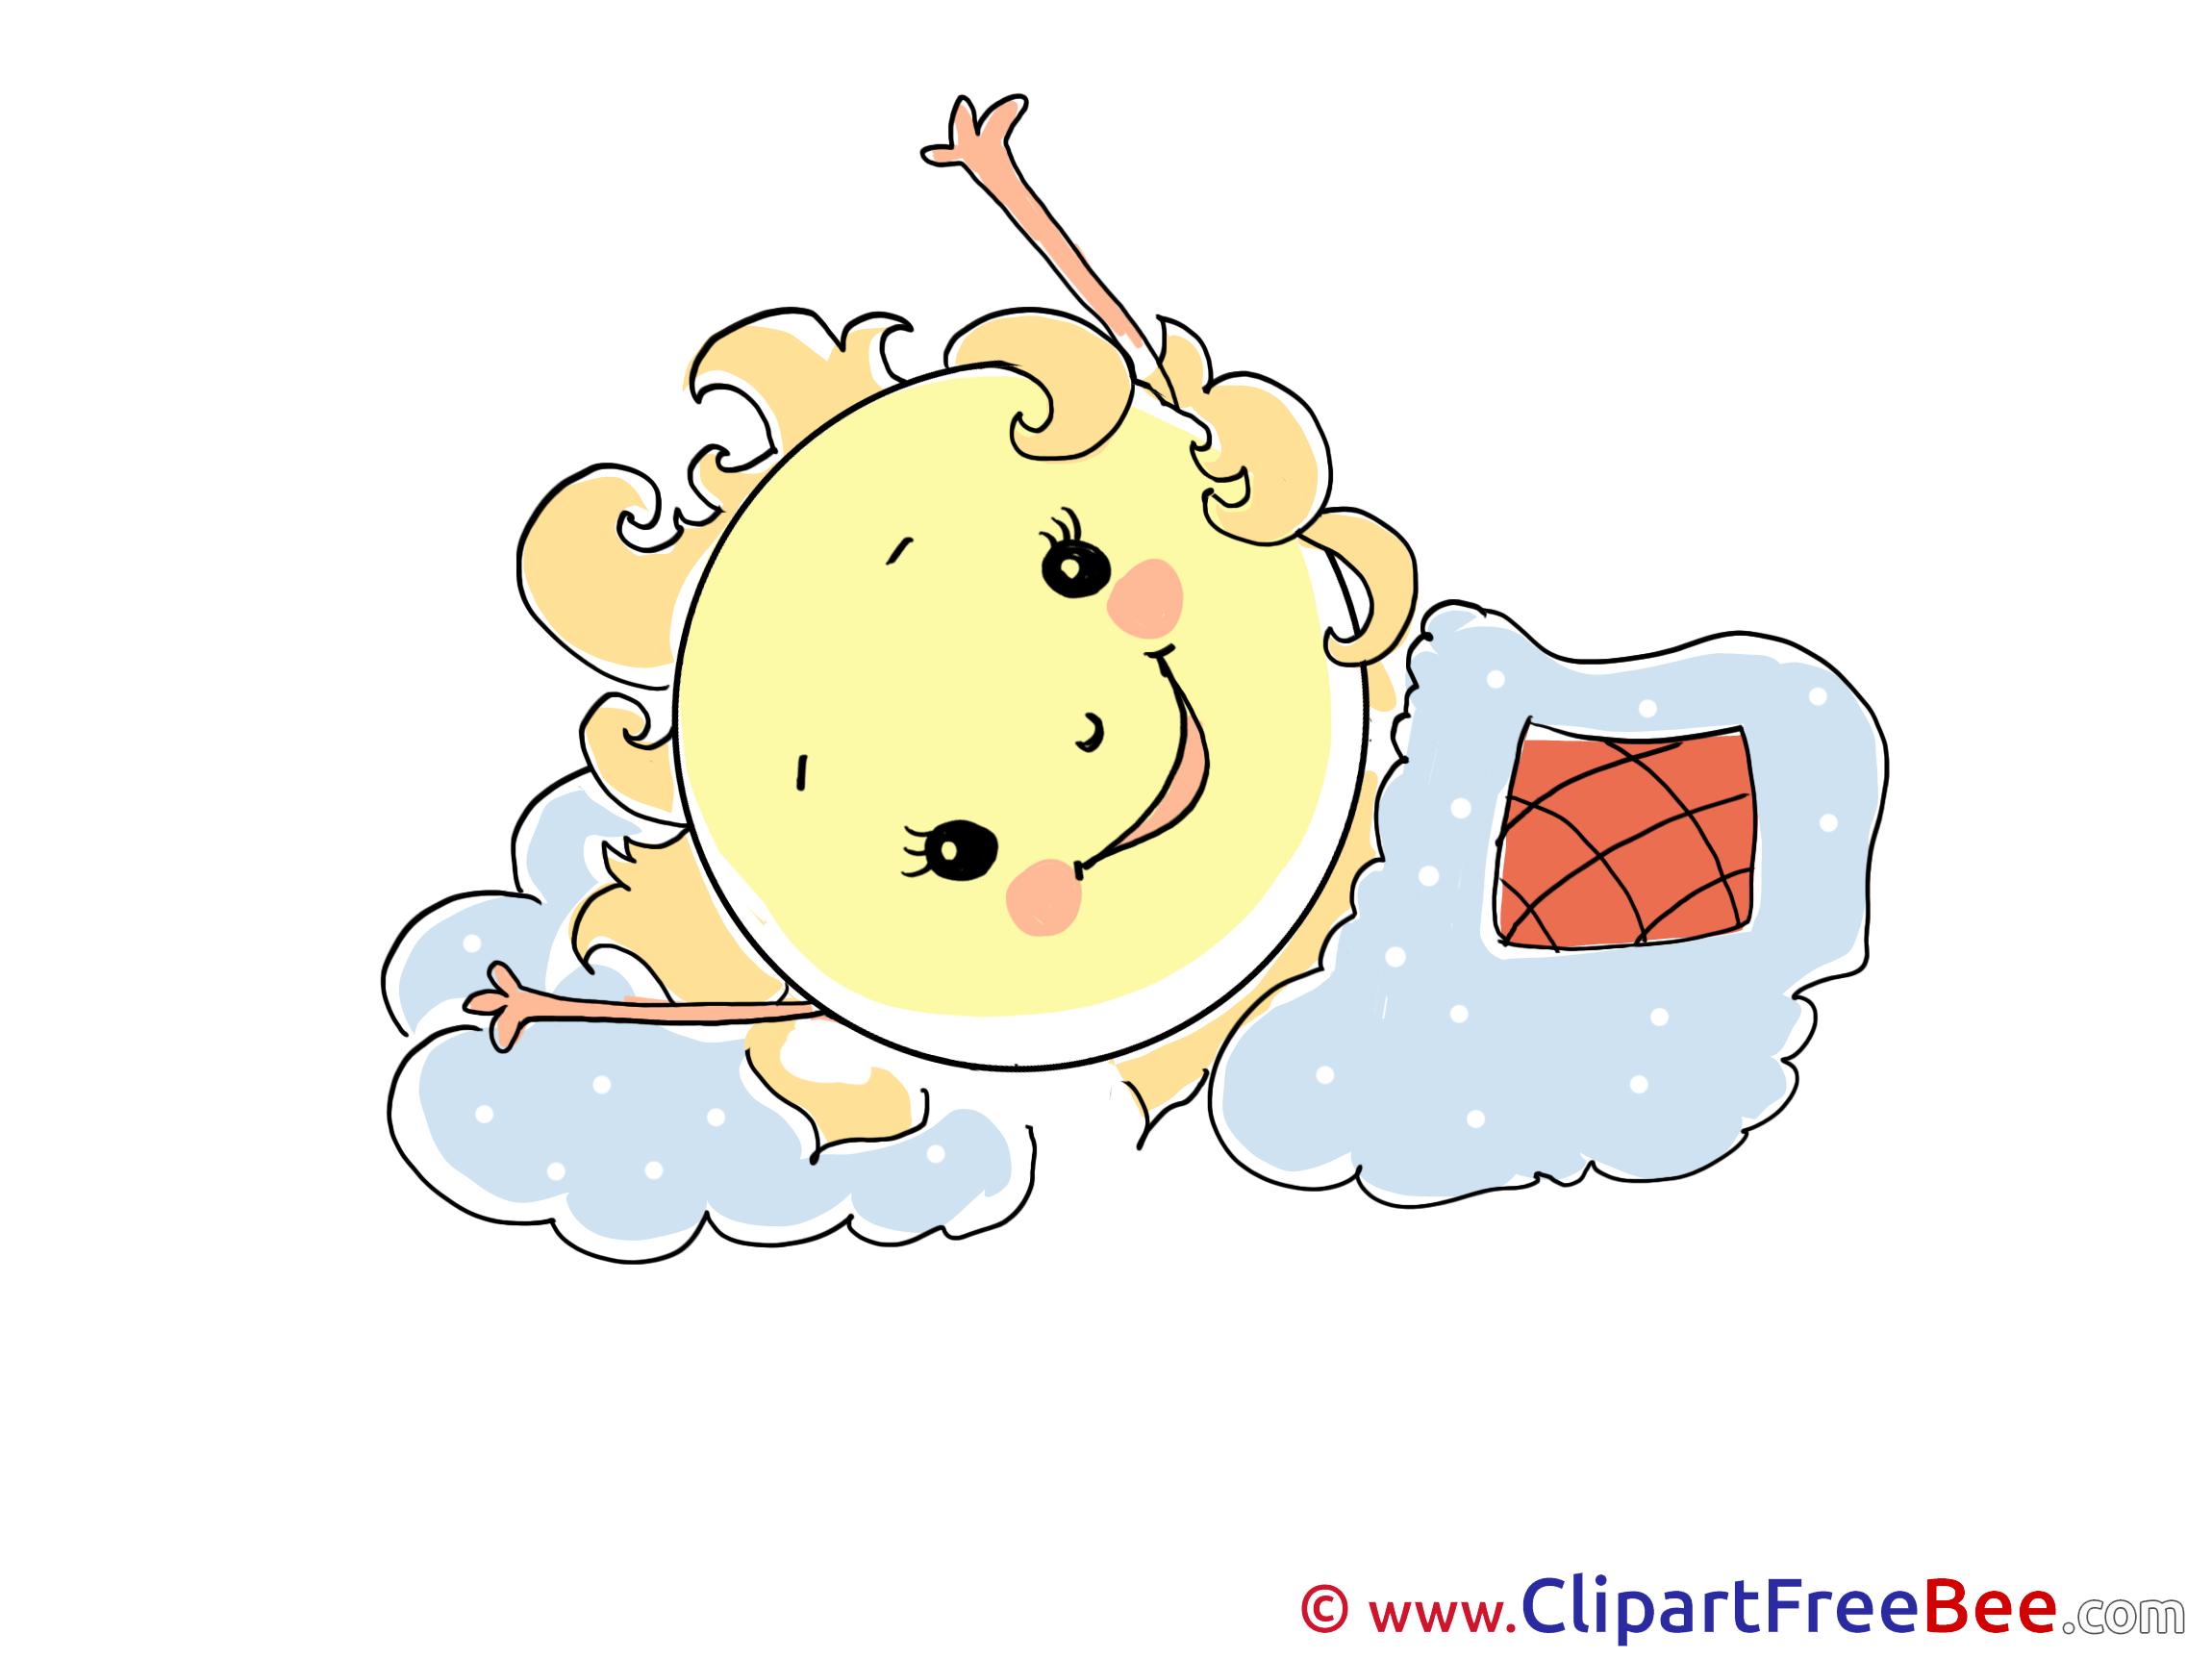 Morning Sun free Illustration download